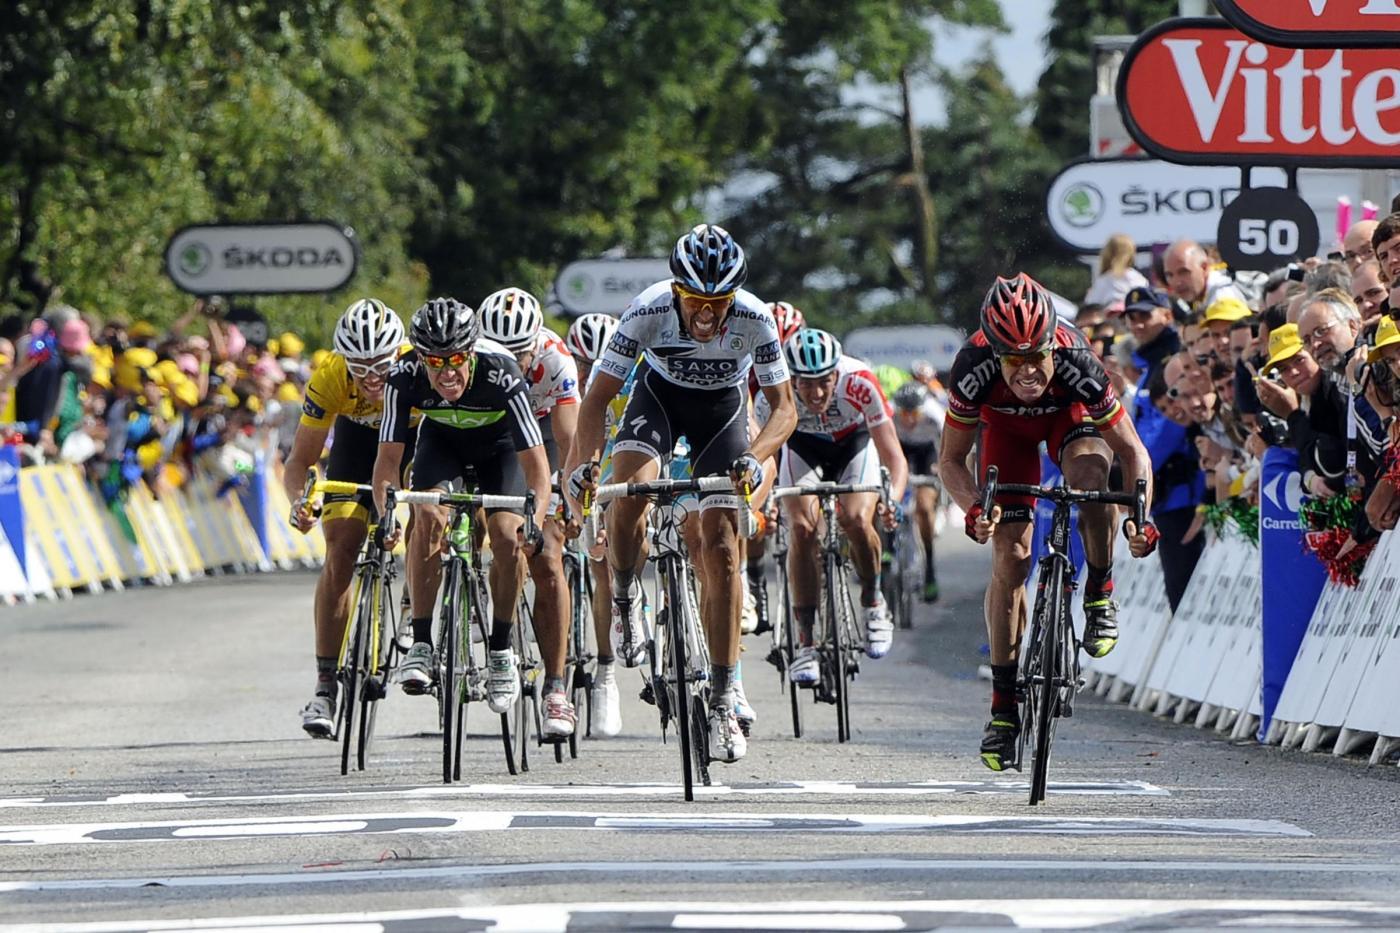 Tour de France 2018 favoriti tappa 6: emozioni assicurate sul Mur de Bretagne!